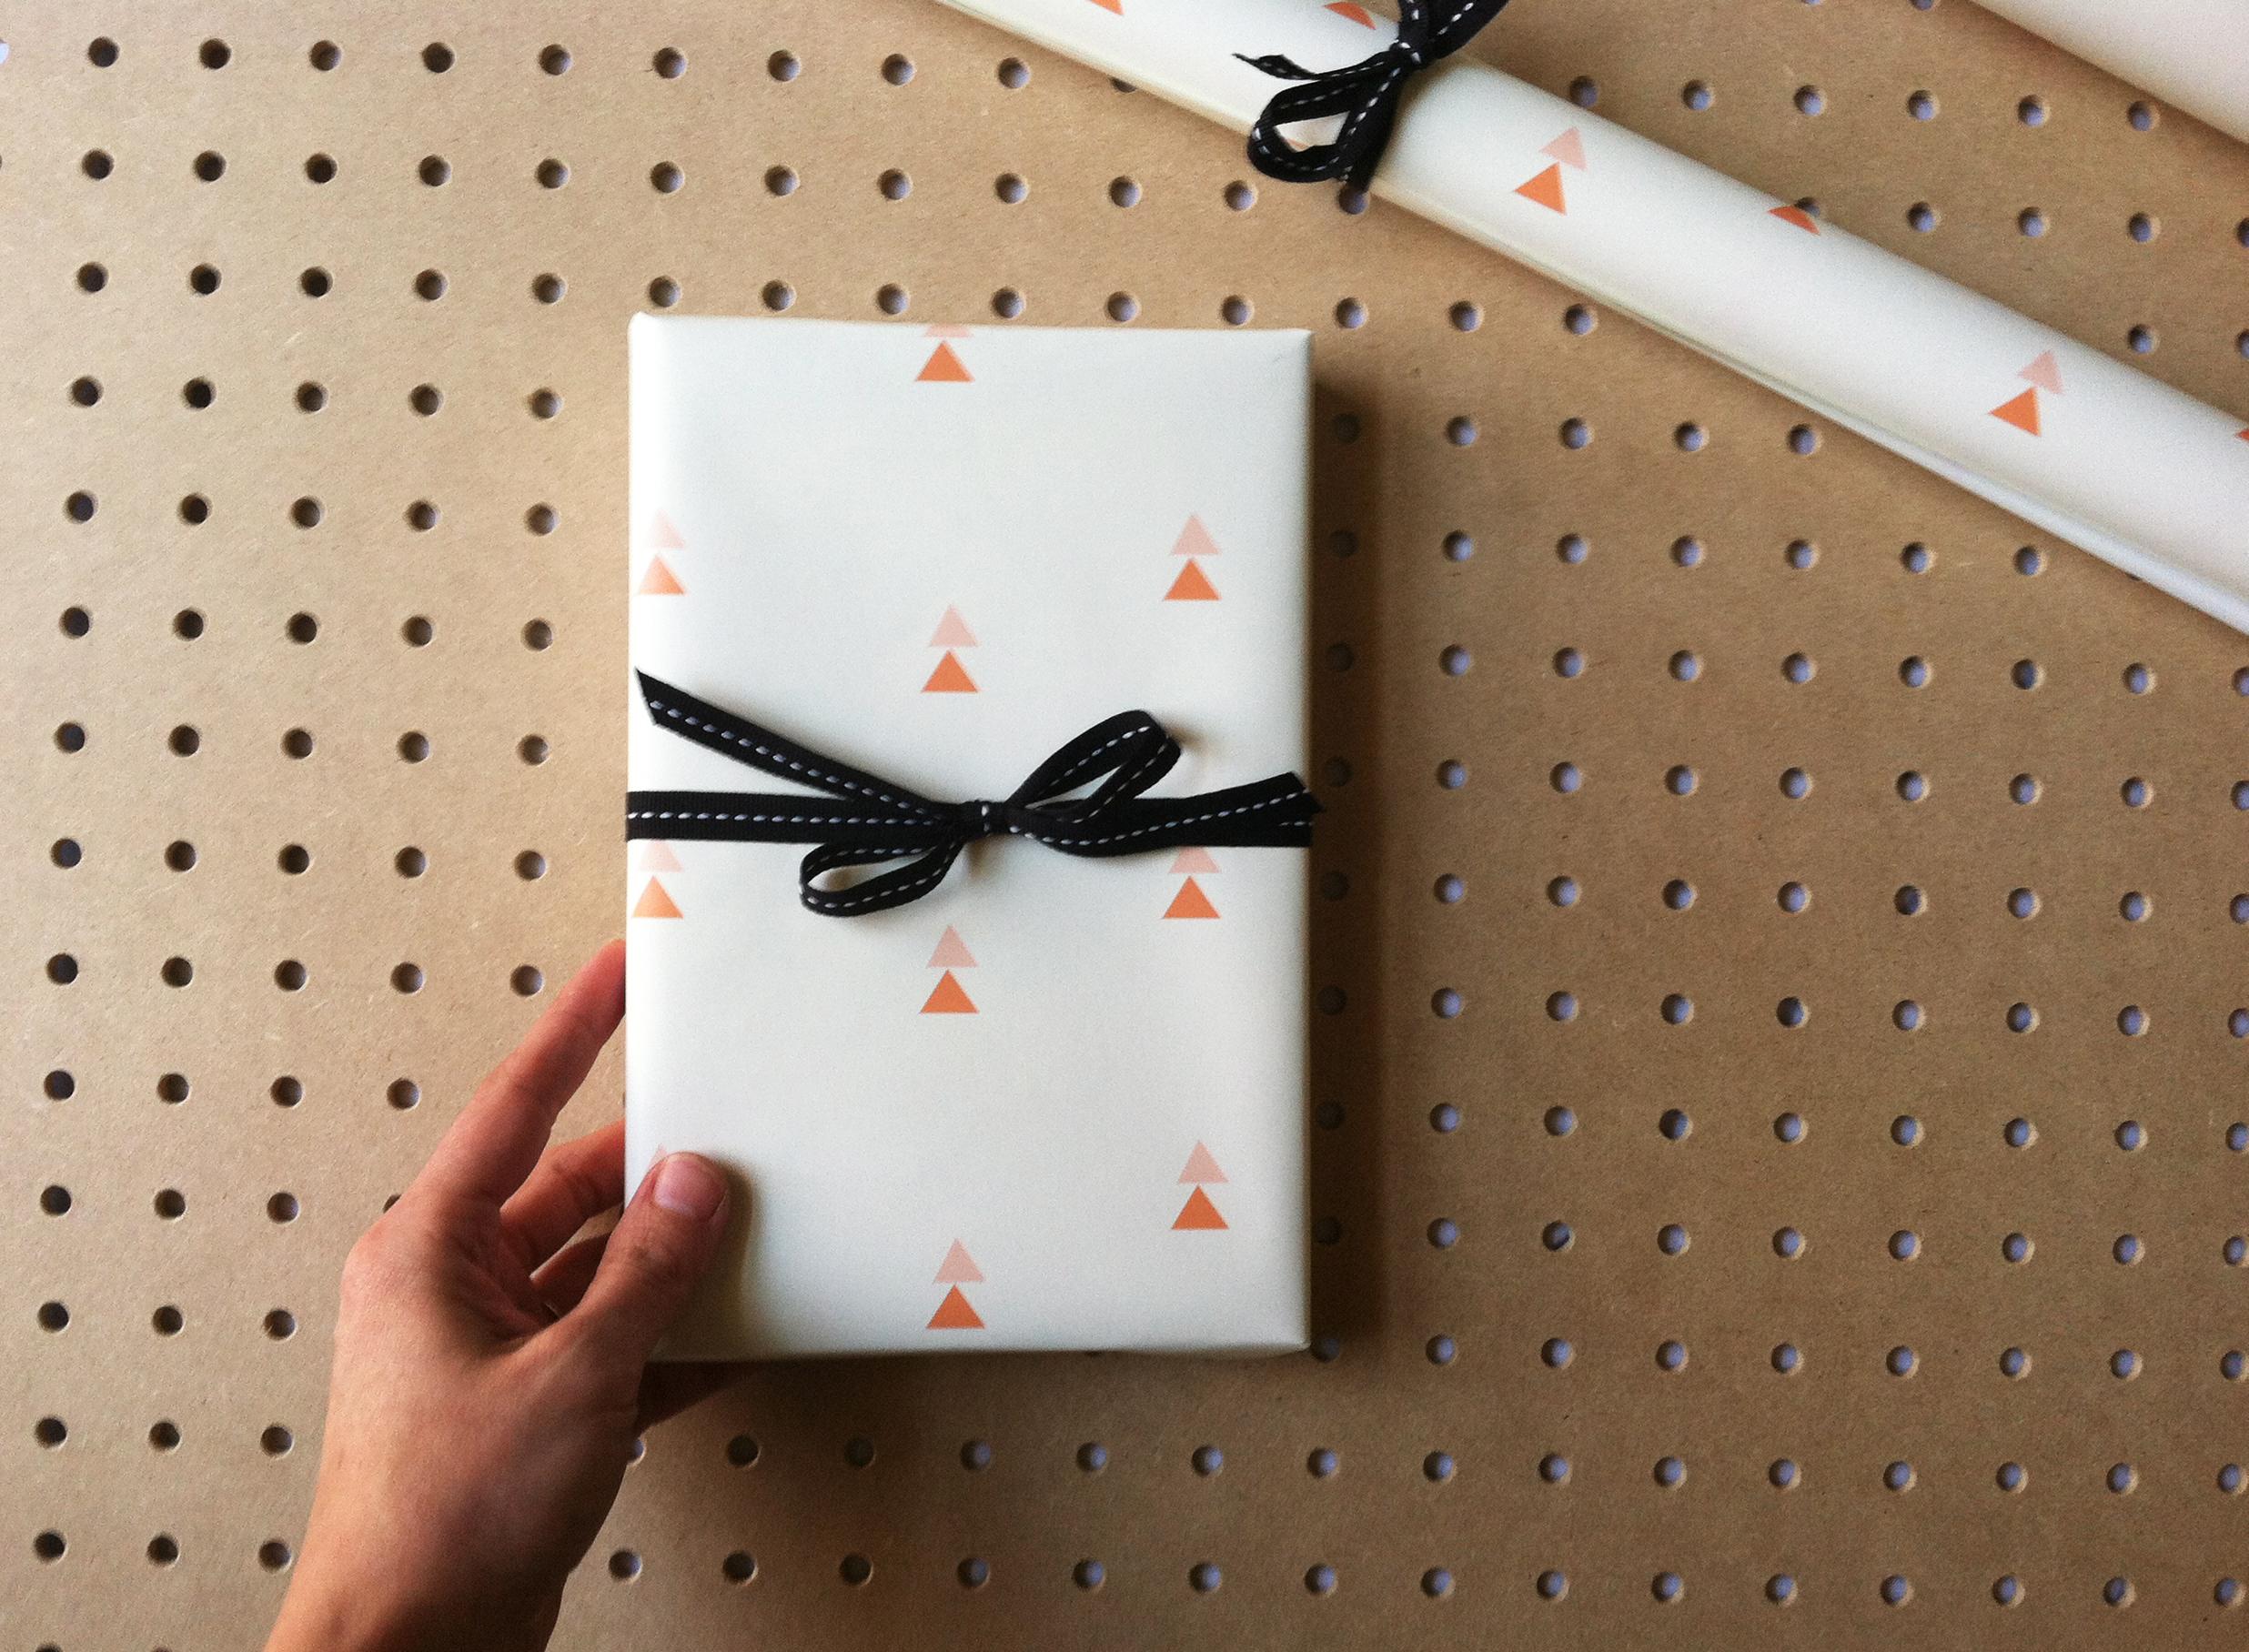 Peachy Keen Gift Wrap. Kathryn Zaremba 2014